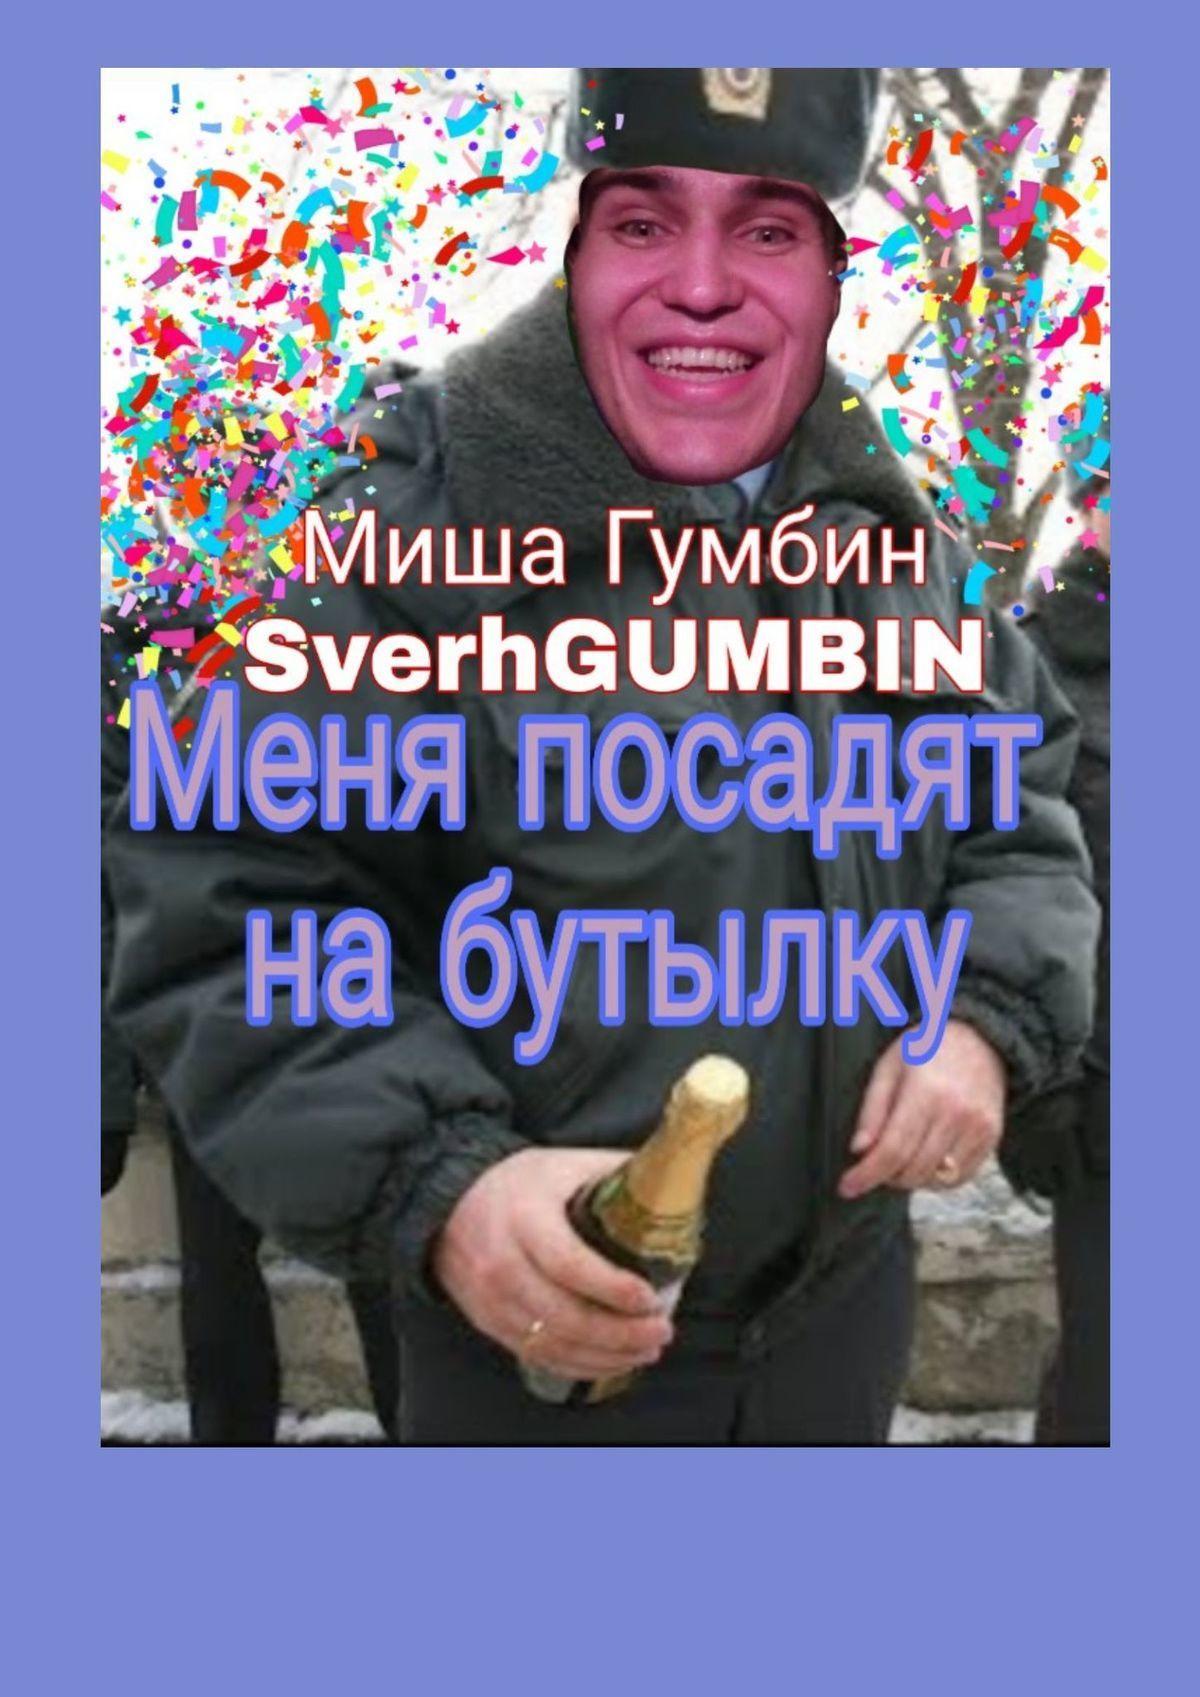 Миша Гумбин - Меня посадят на бутылку